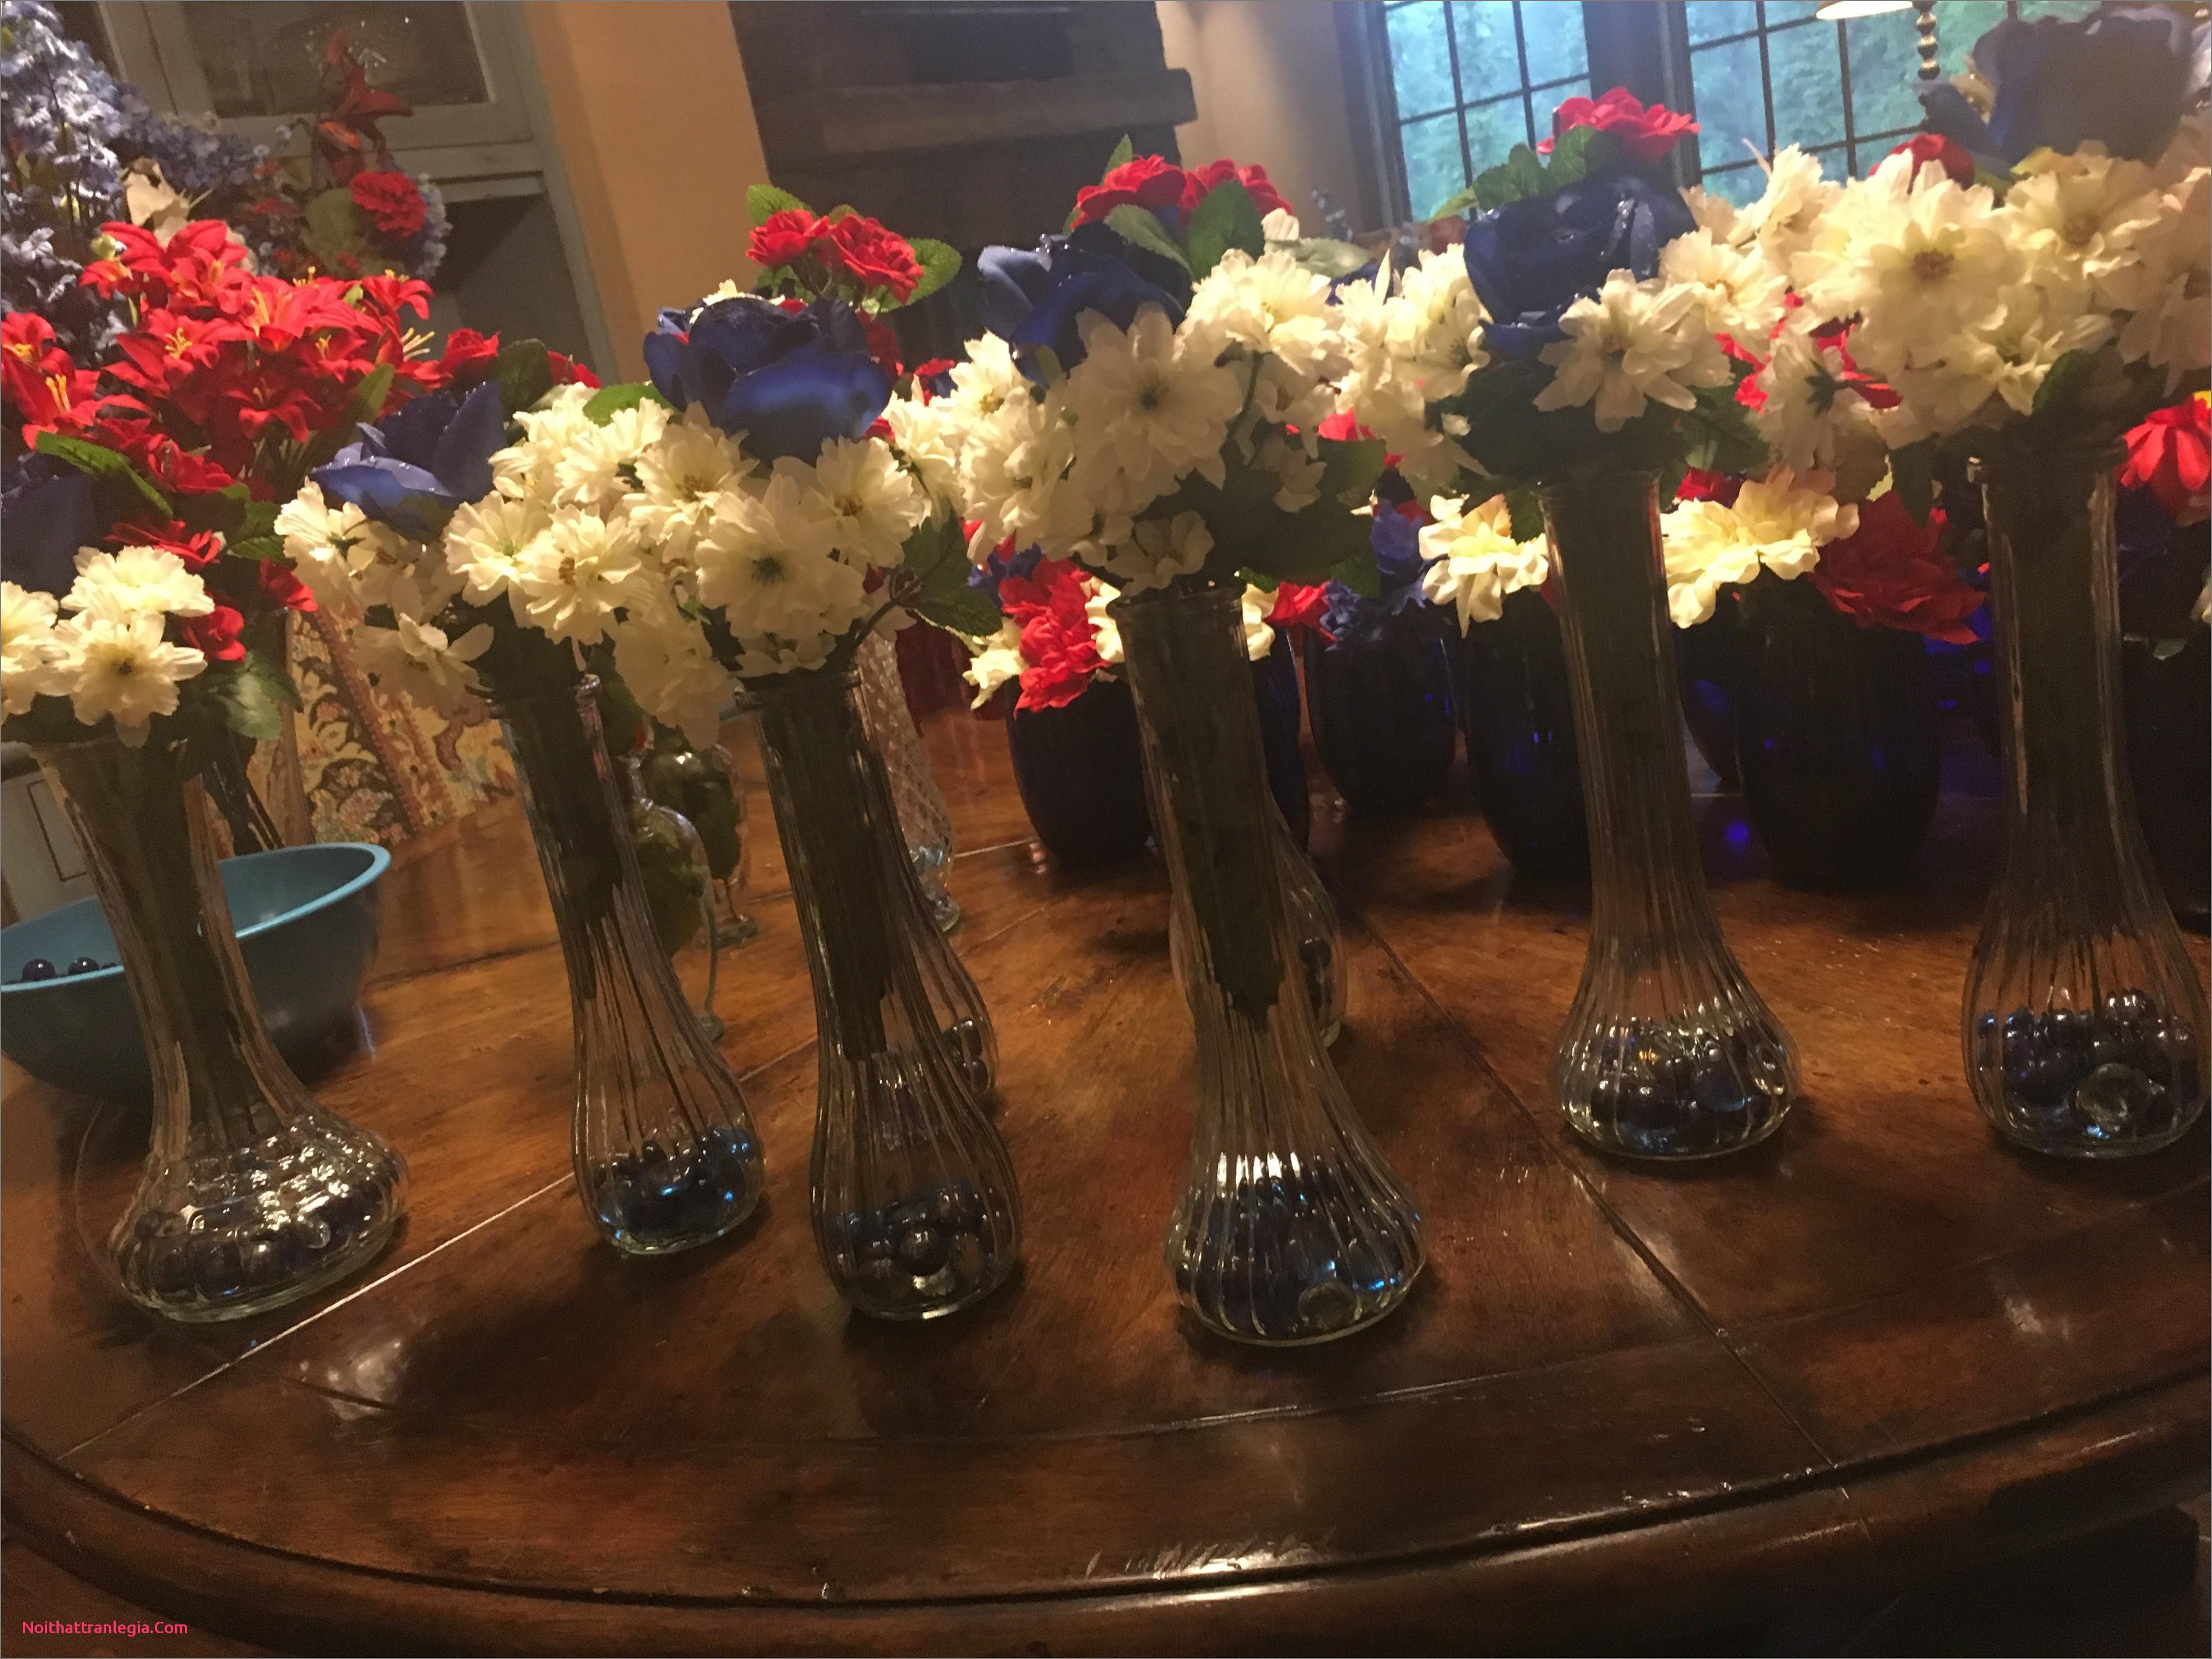 glass floor vase ideas of 20 wedding vases noithattranlegia vases design intended for decoration line luxury dollar tree wedding decorations awesome h vases dollar vase i 0d